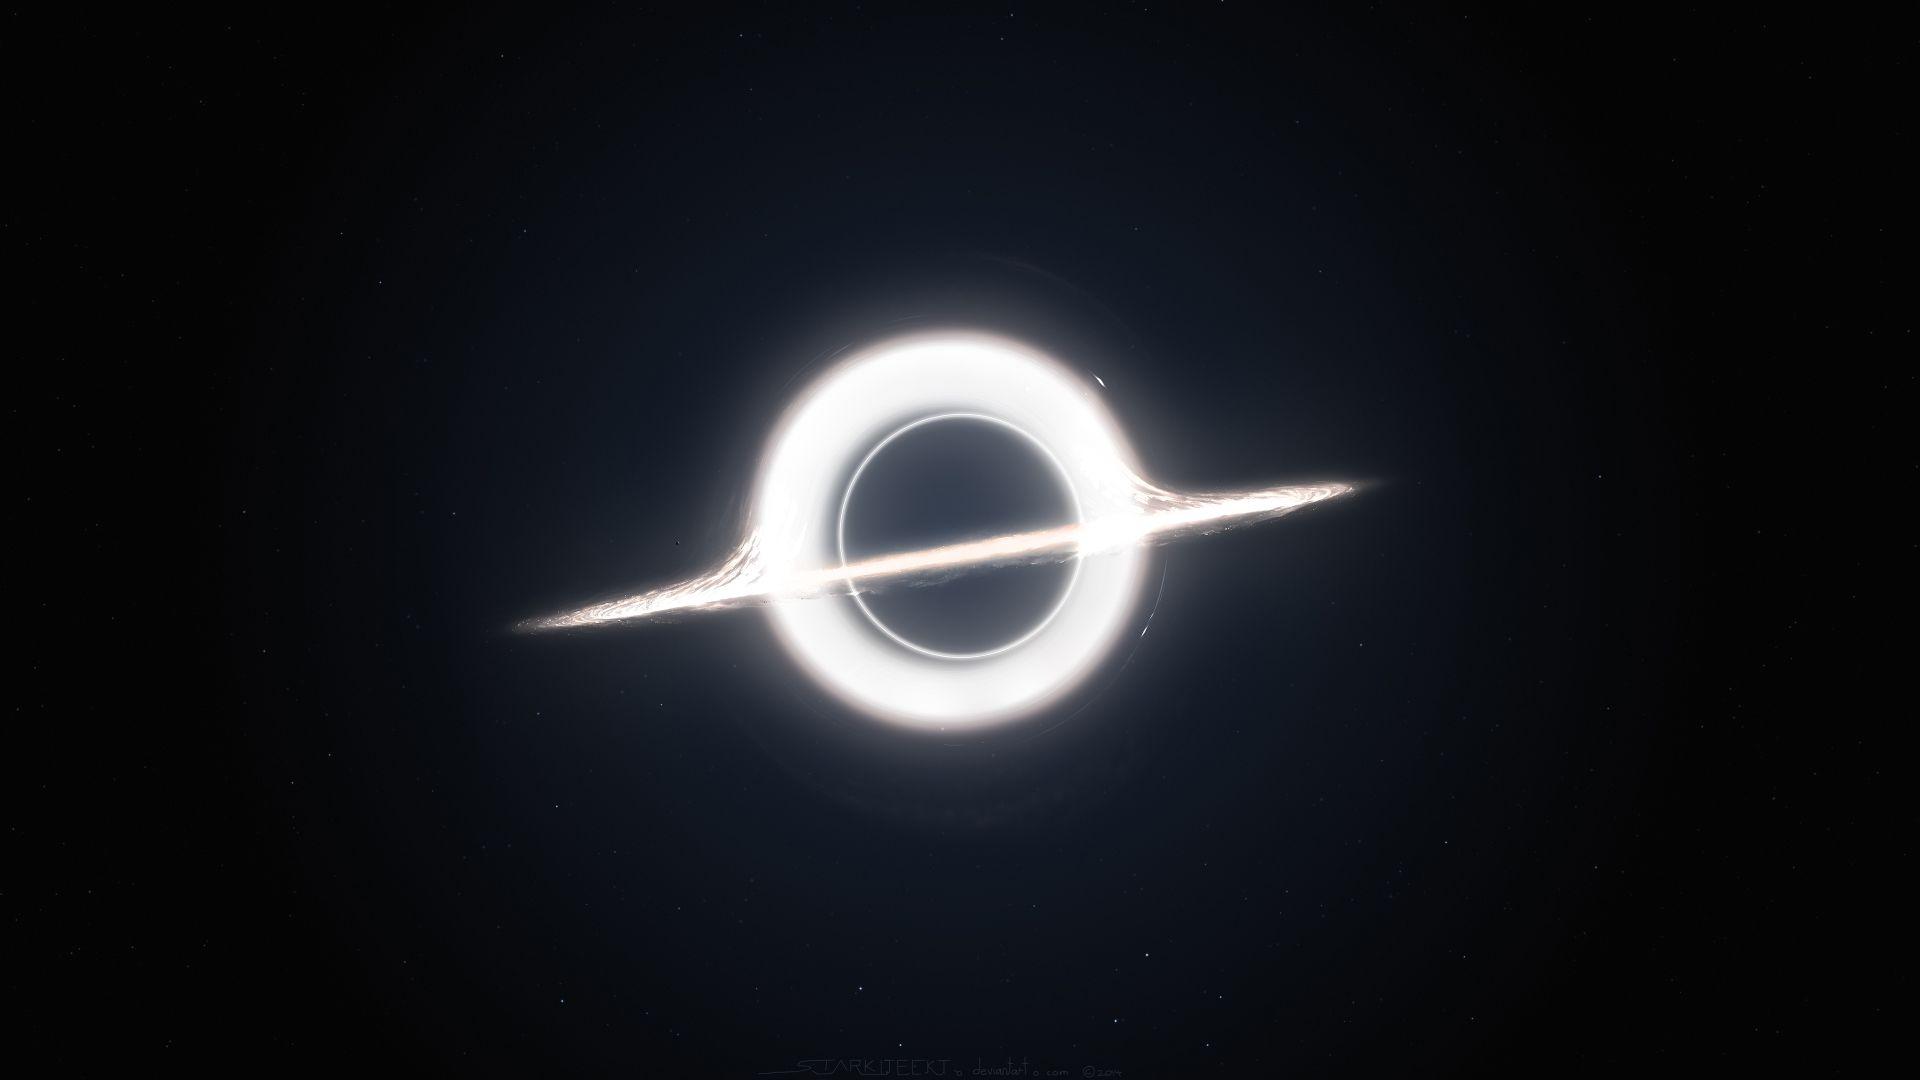 Black Hole, Desktop Wallpaper